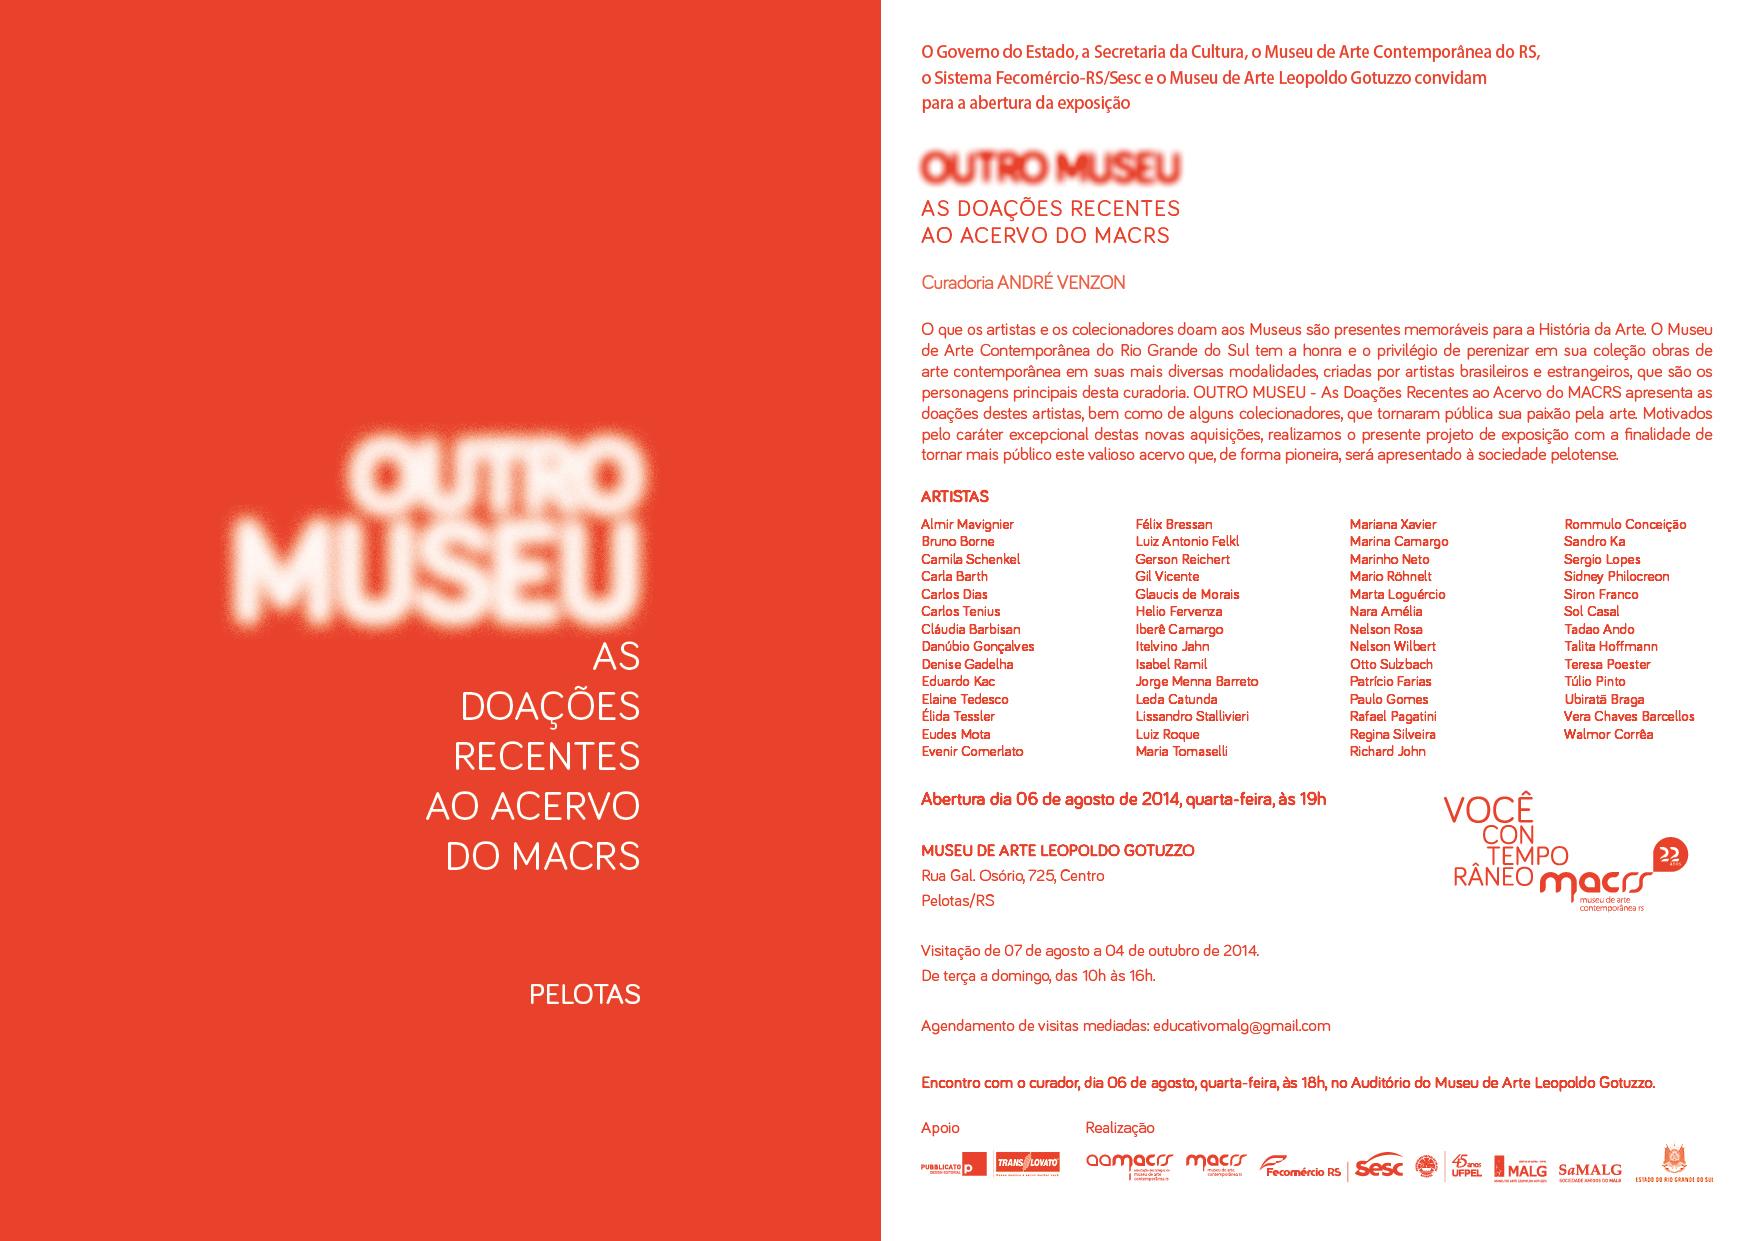 Outro Museu